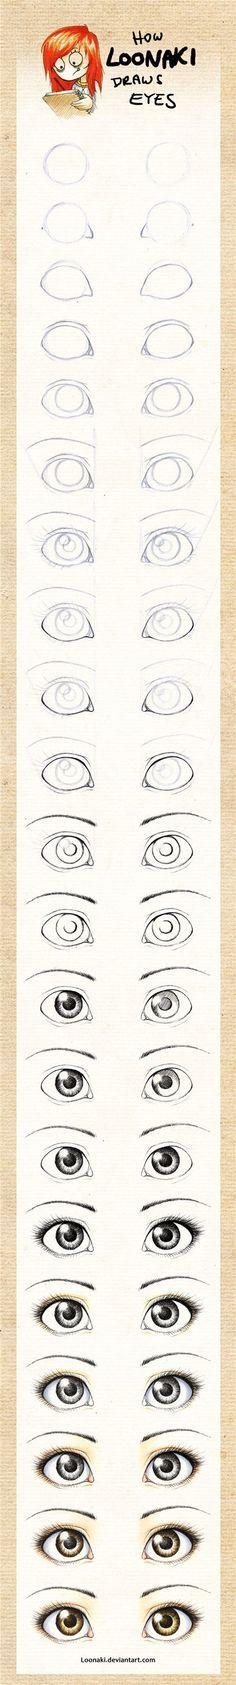 @rebekahmomo I found out how to draw eyes 5e3c46462f40b9d1bbc141aa5ff91f73.jpg (420×3000)